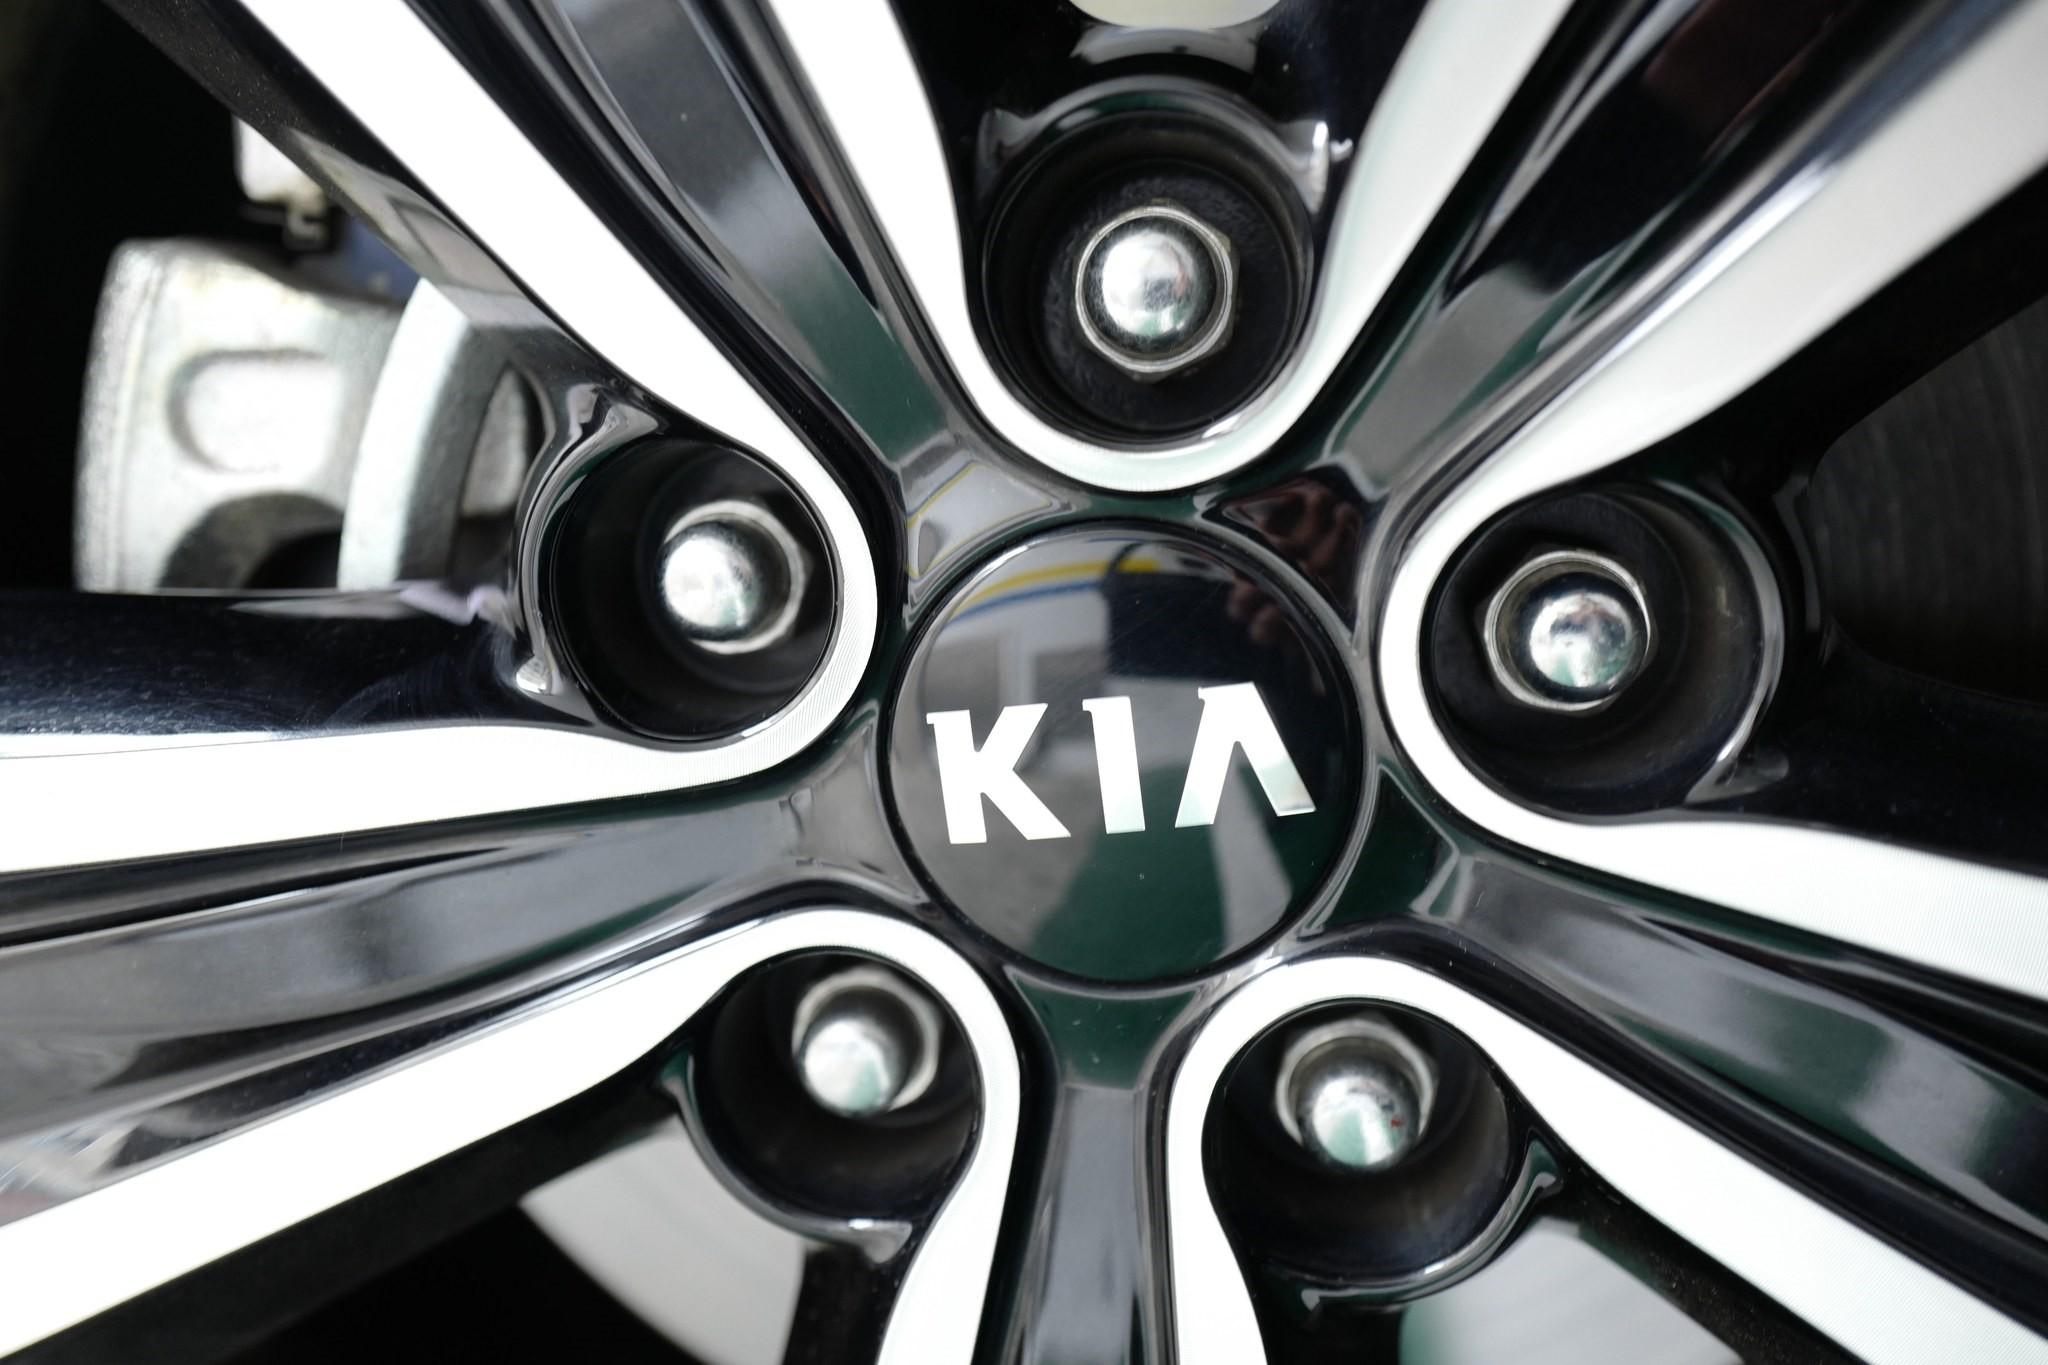 A view of the KIA Motors logo on the wheel of a car in Seoul, South Korea, 12 May 2017. (EPA Photo)